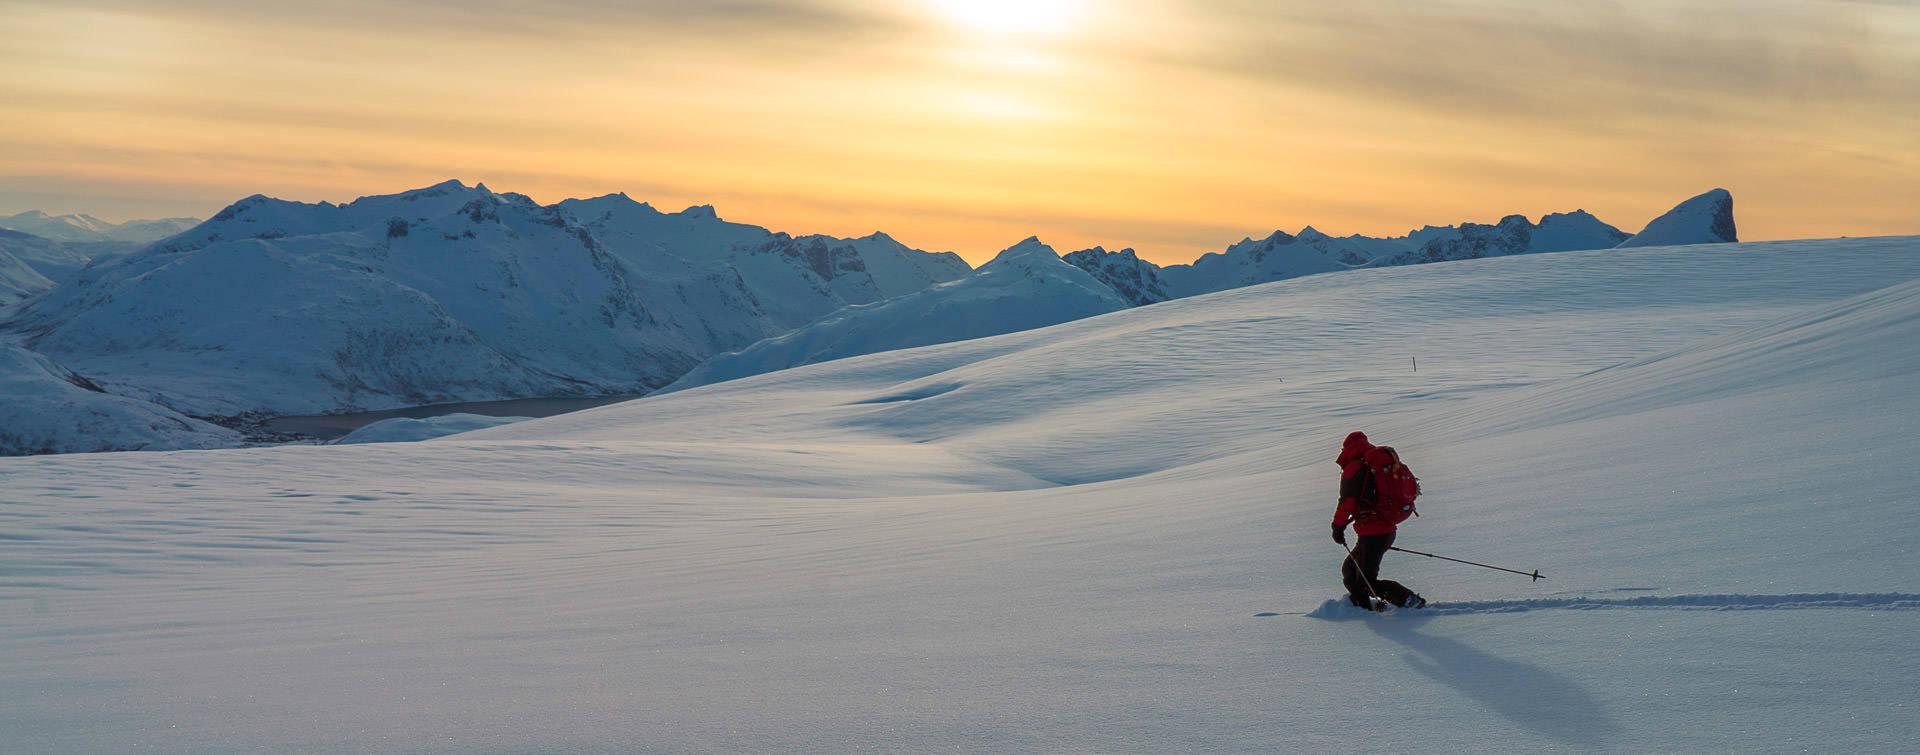 Skiing Tromso